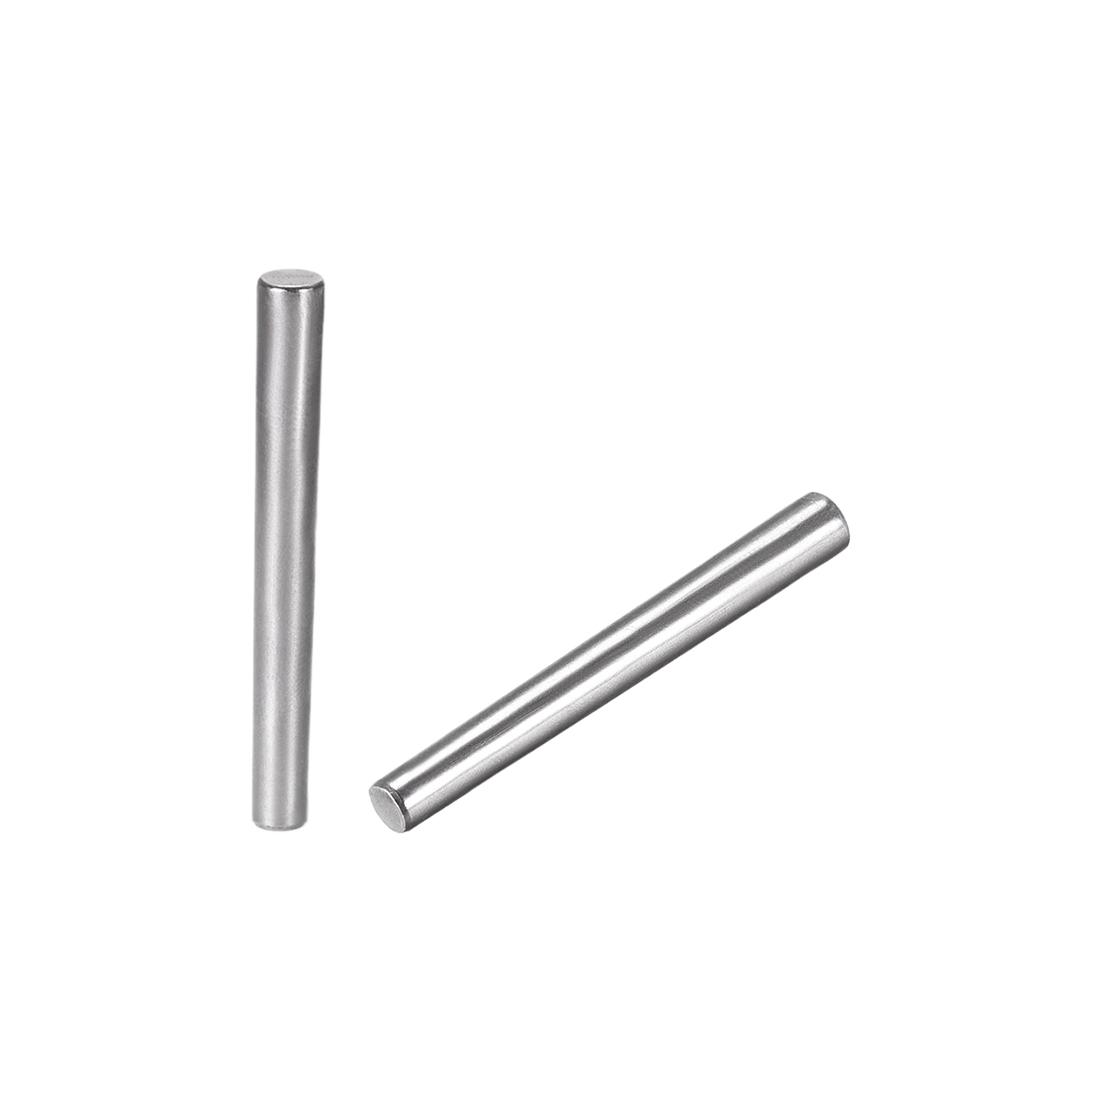 Carbon Steel GB117 50mm Length 5mm x 6mm Small End Diameter 1:50 Taper Pin 20Pcs